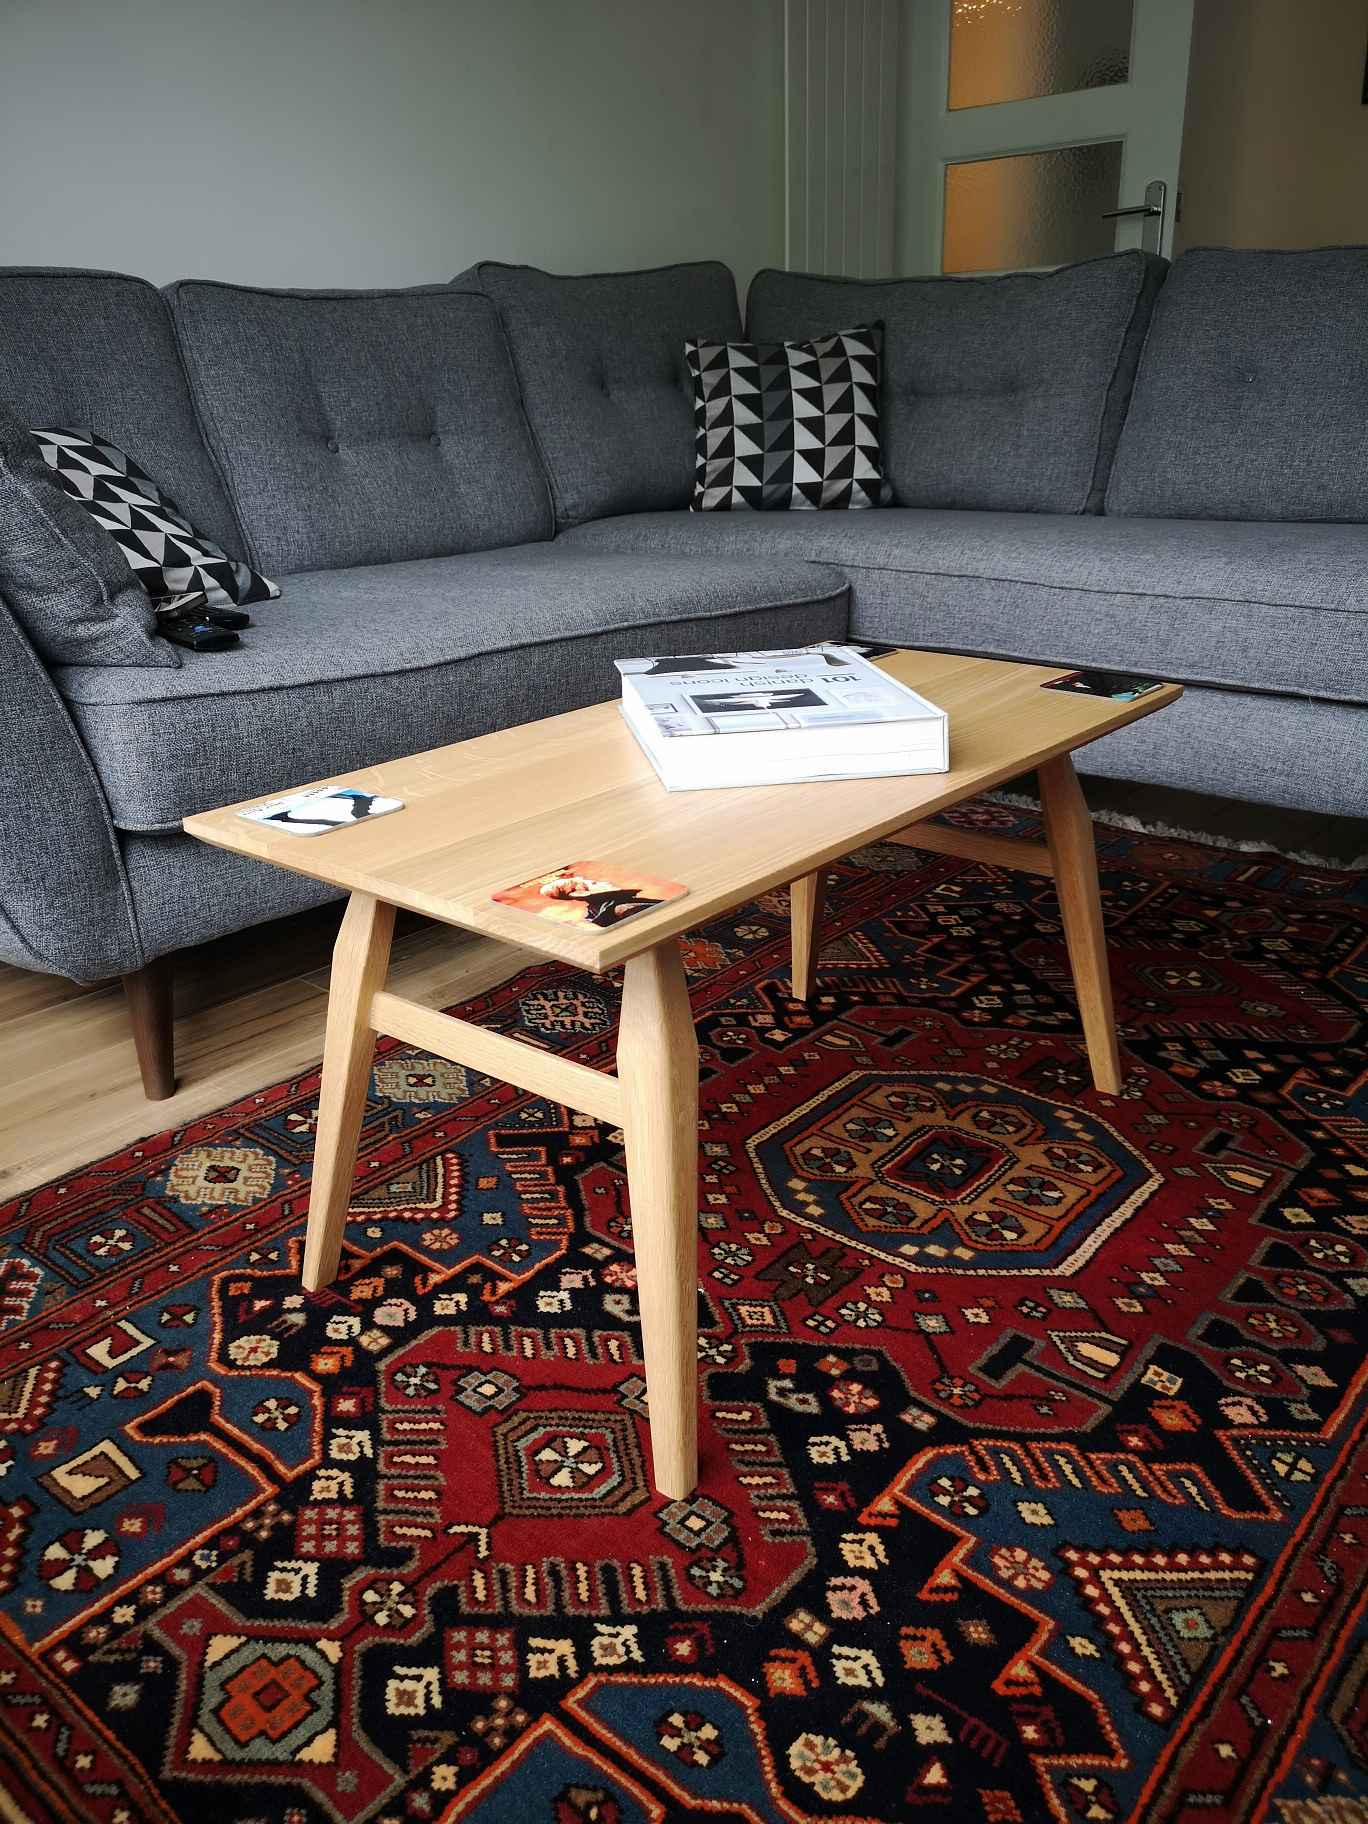 Oak coffee table in living room